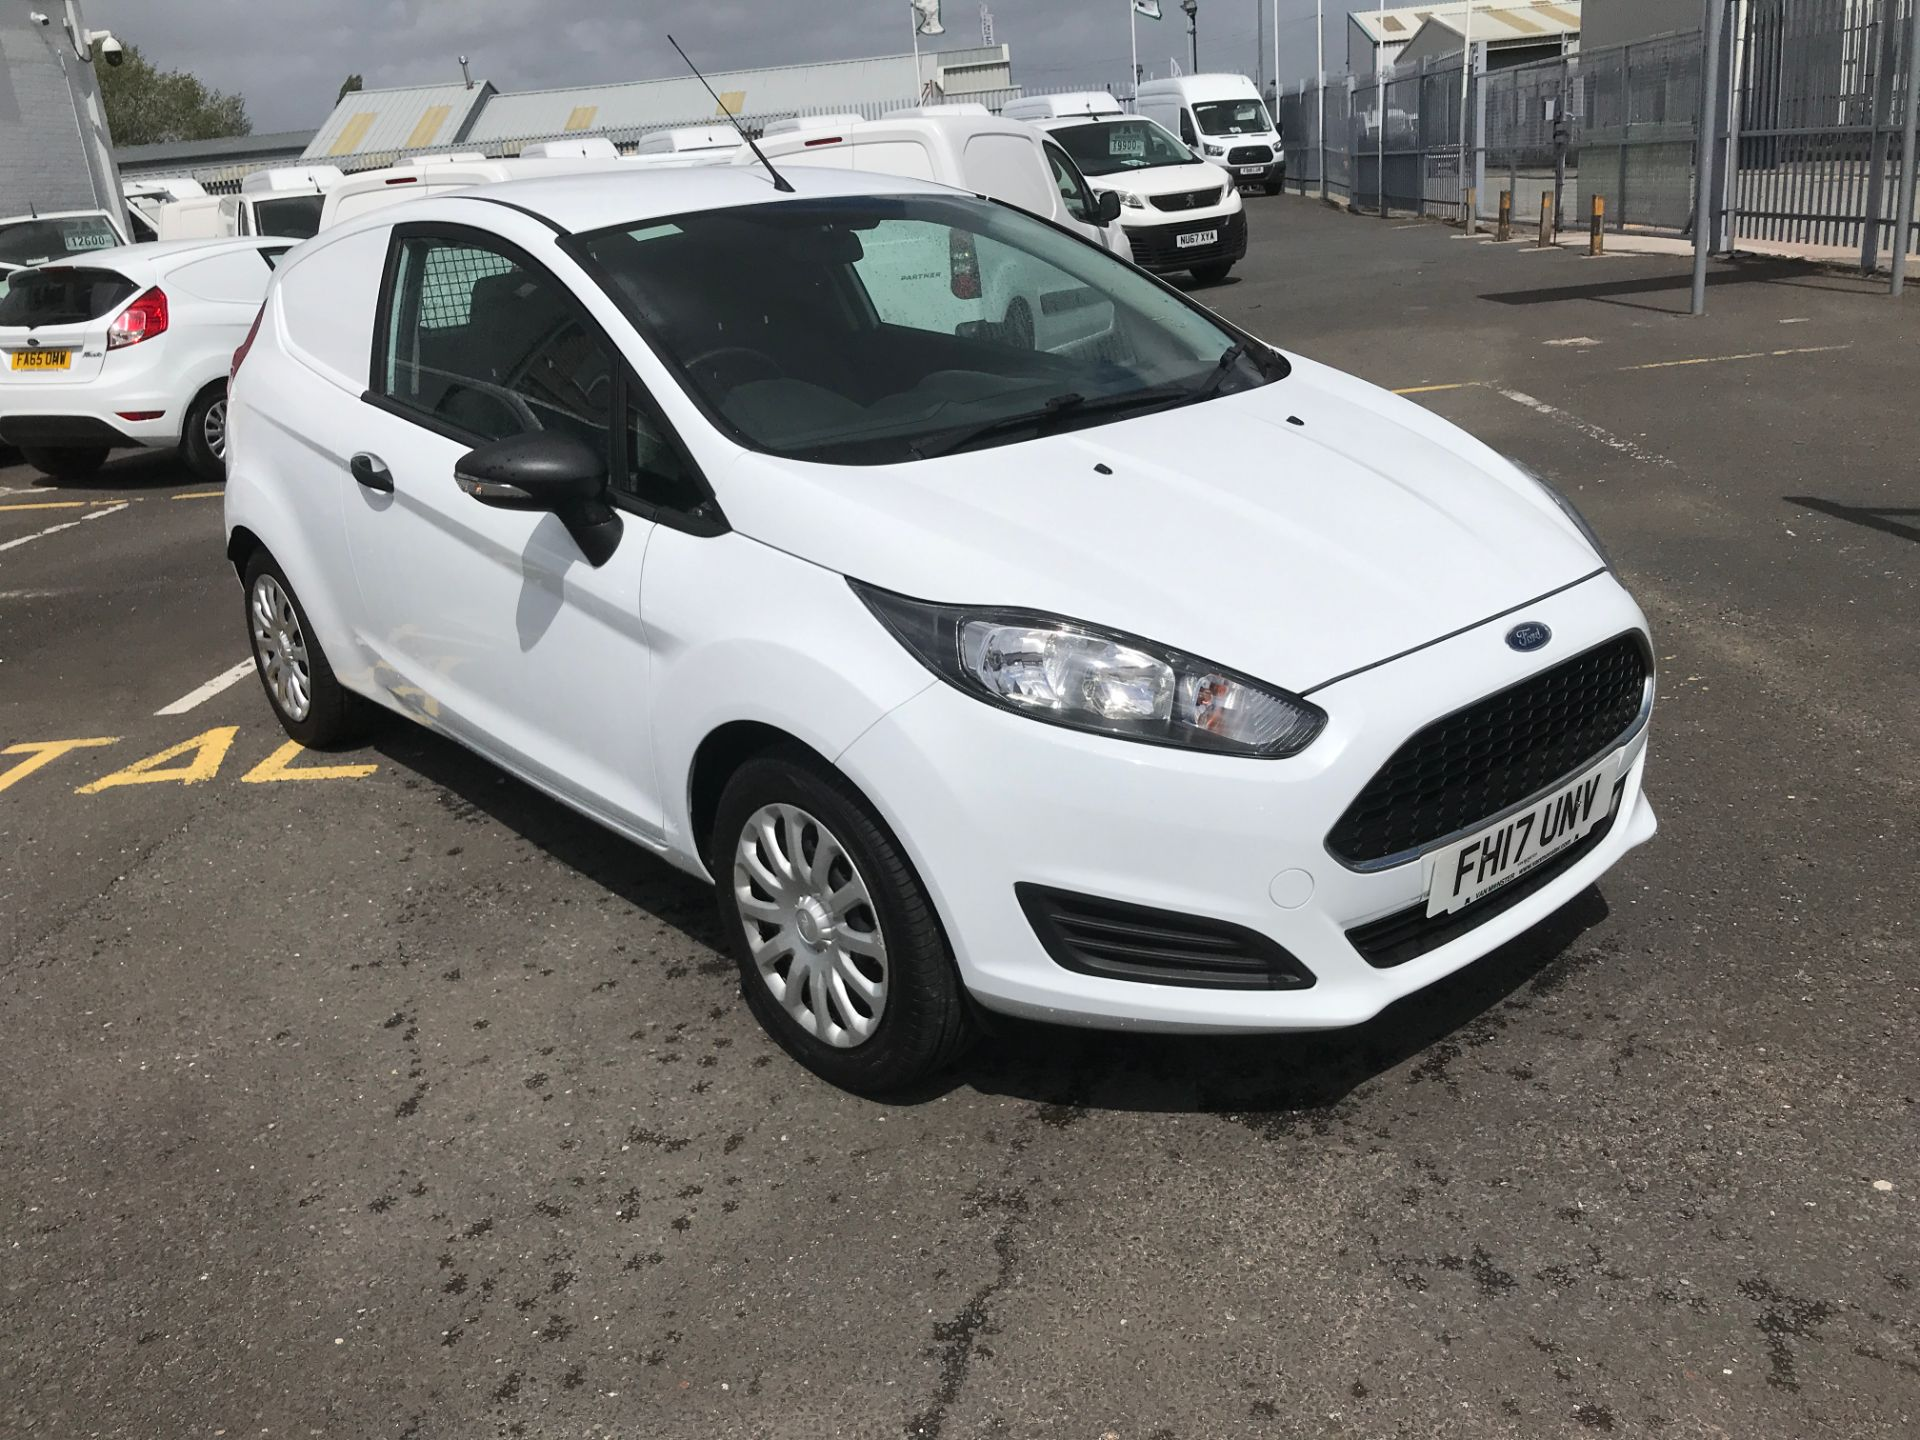 2017 Ford Fiesta 1.5TDCI 75PS EURO 6, AIR CON (FH17UNV)